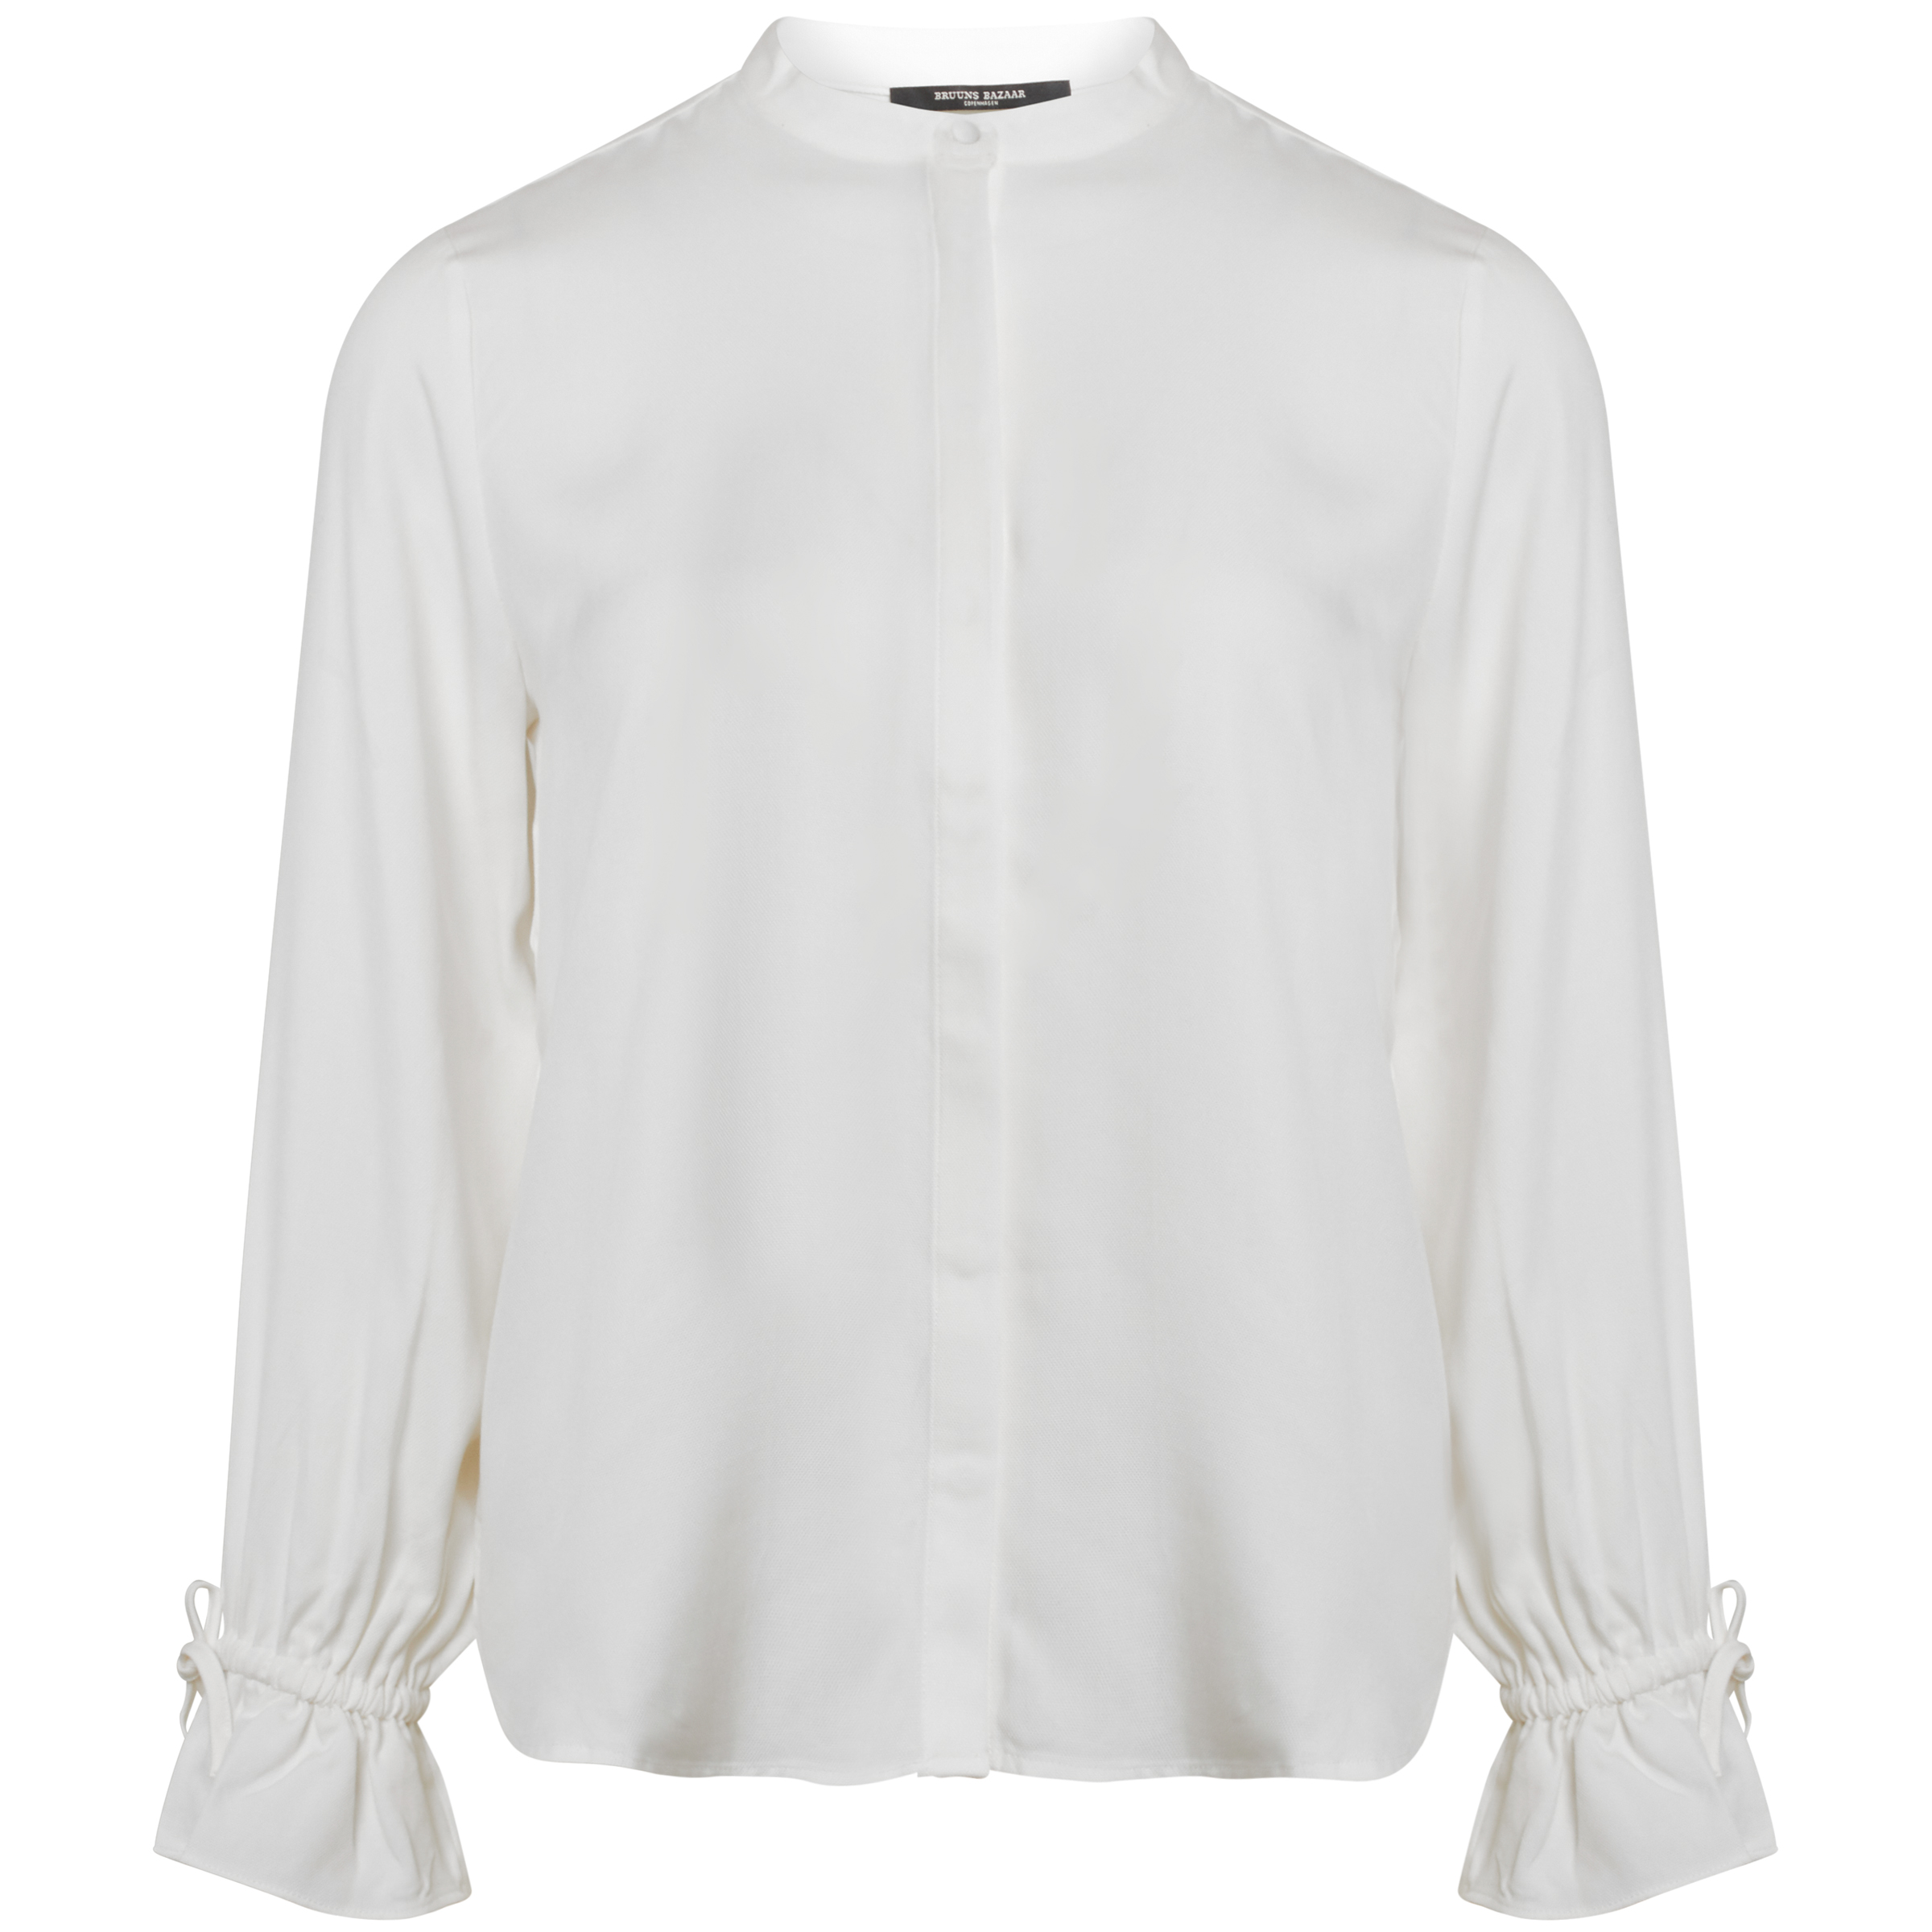 Pralenza Shirt